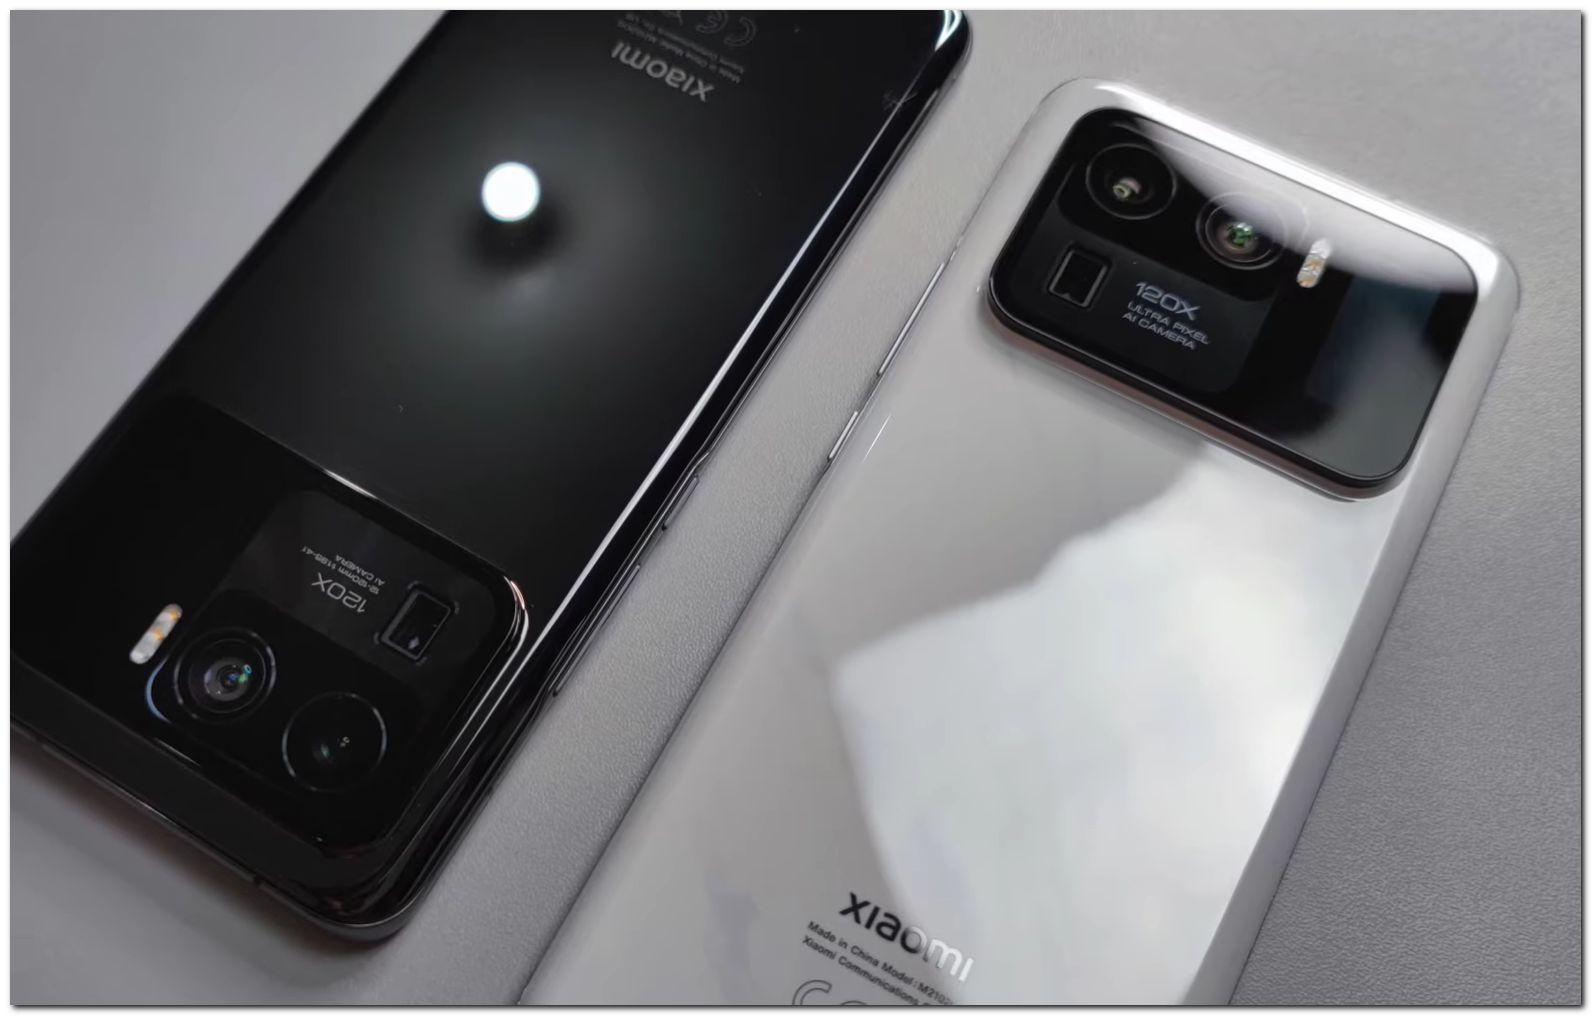 iPhone 13 Pro Max & Mi 11 Ultra, iPhone 13 Pro Max Camera Mi 11 Ultra Camera, iPhone 13 Pro Max Camera Vs Mi 11 Ultra Camera,iPhone 13 Pro Max Vs Mi 11 Ultra Speed, iPhone 13 Pro Max Camera,Mi 11 Ultra Cam